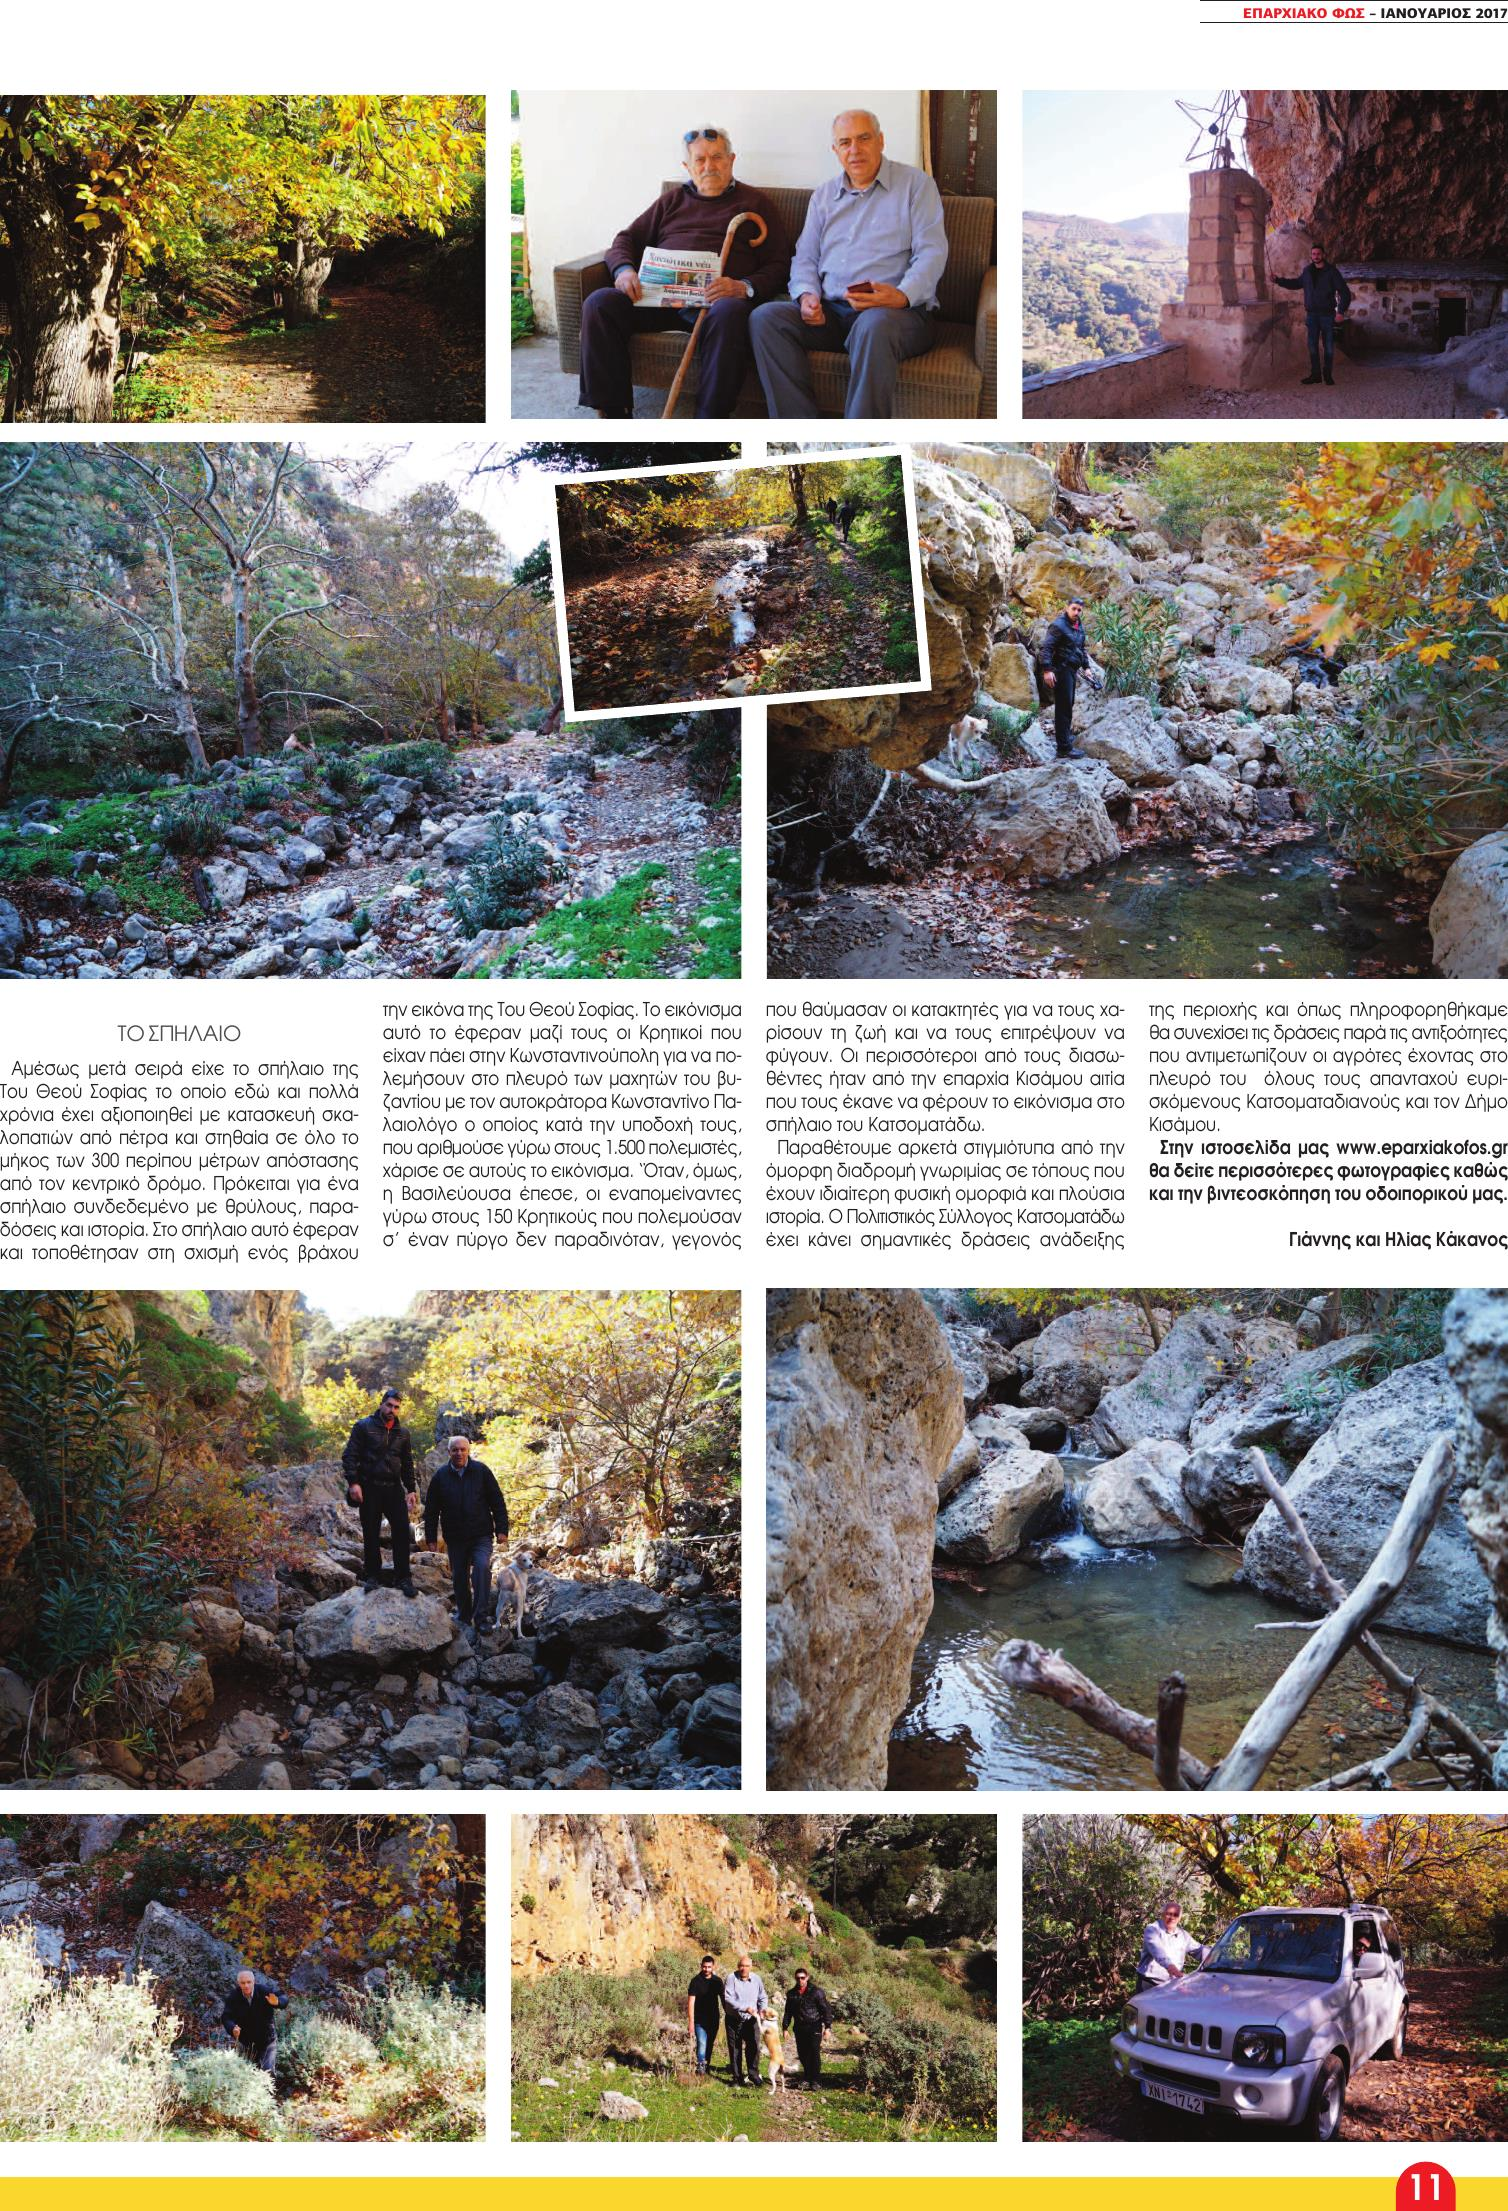 16 KAKANOS (Page 11)